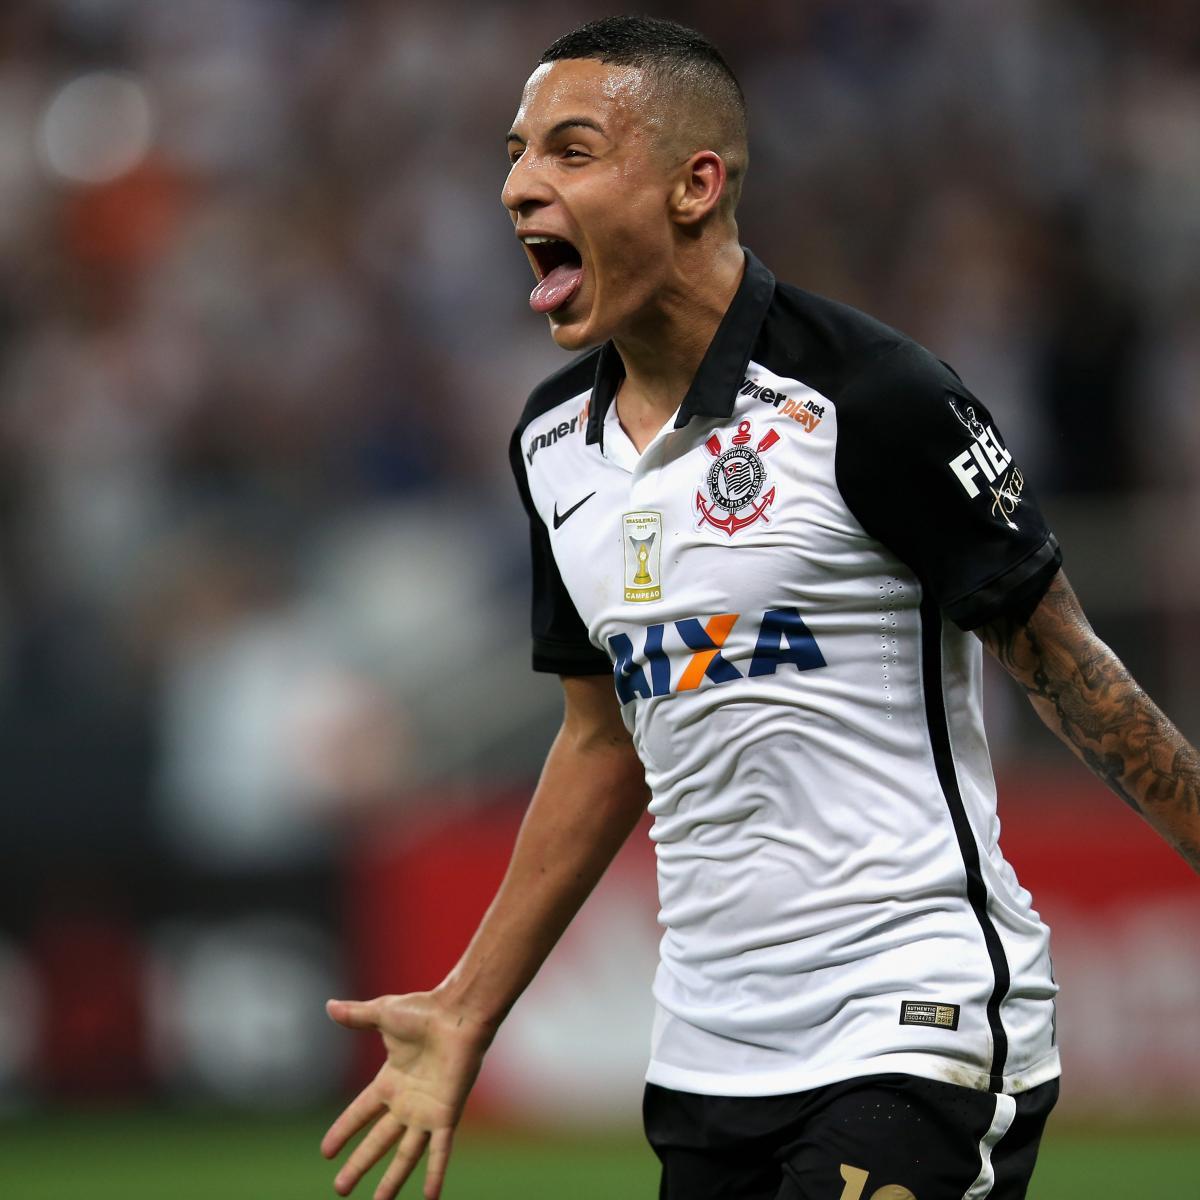 Manchester United Transfer News Latest On Lucas Moura And: Manchester United Transfer News: Guilherme Arana Talks